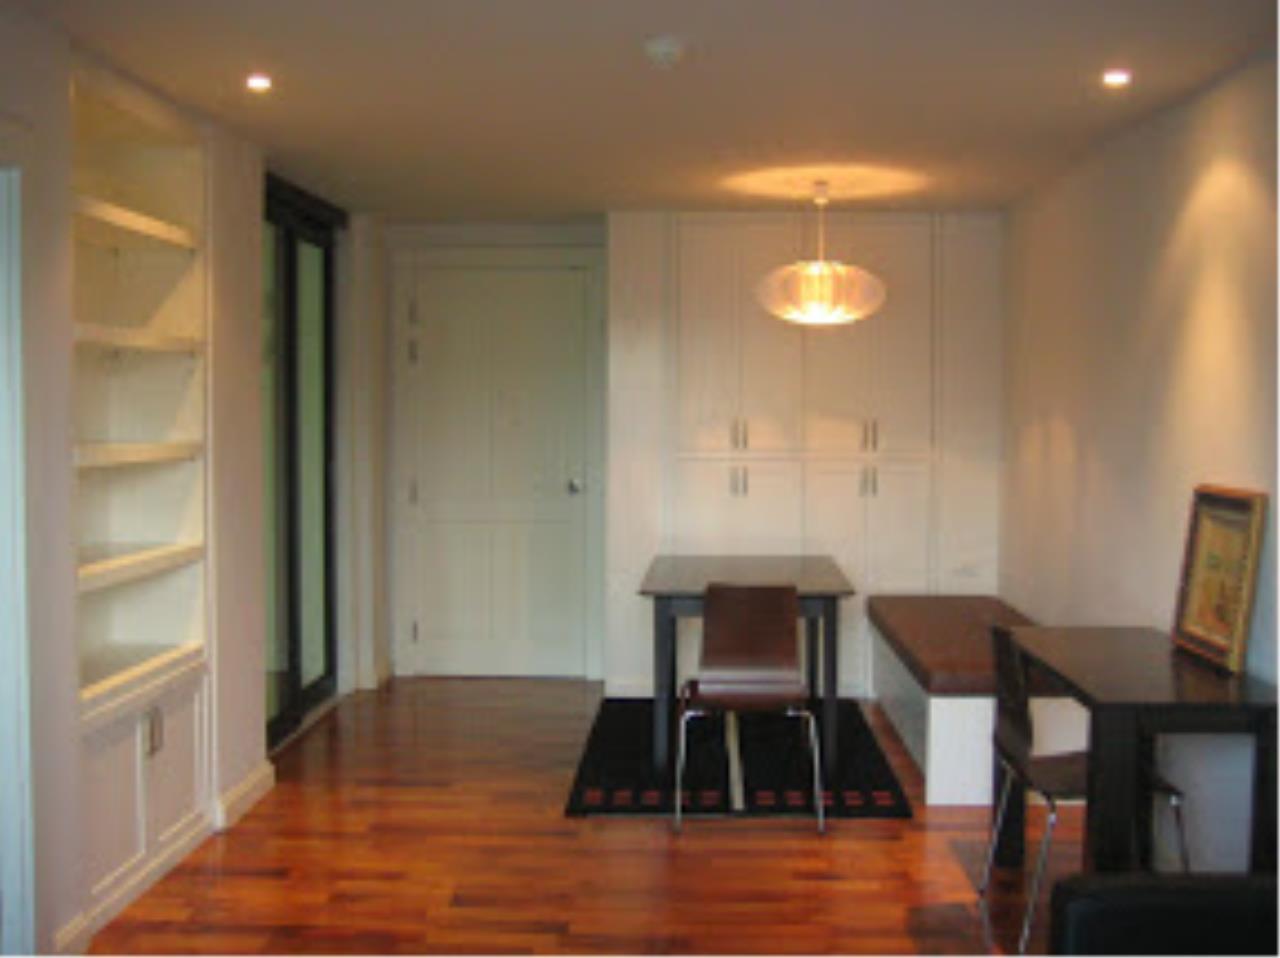 BKK Condos Agency's 1 bedroom condo for rent in Thong Lo at 49 Plus  21